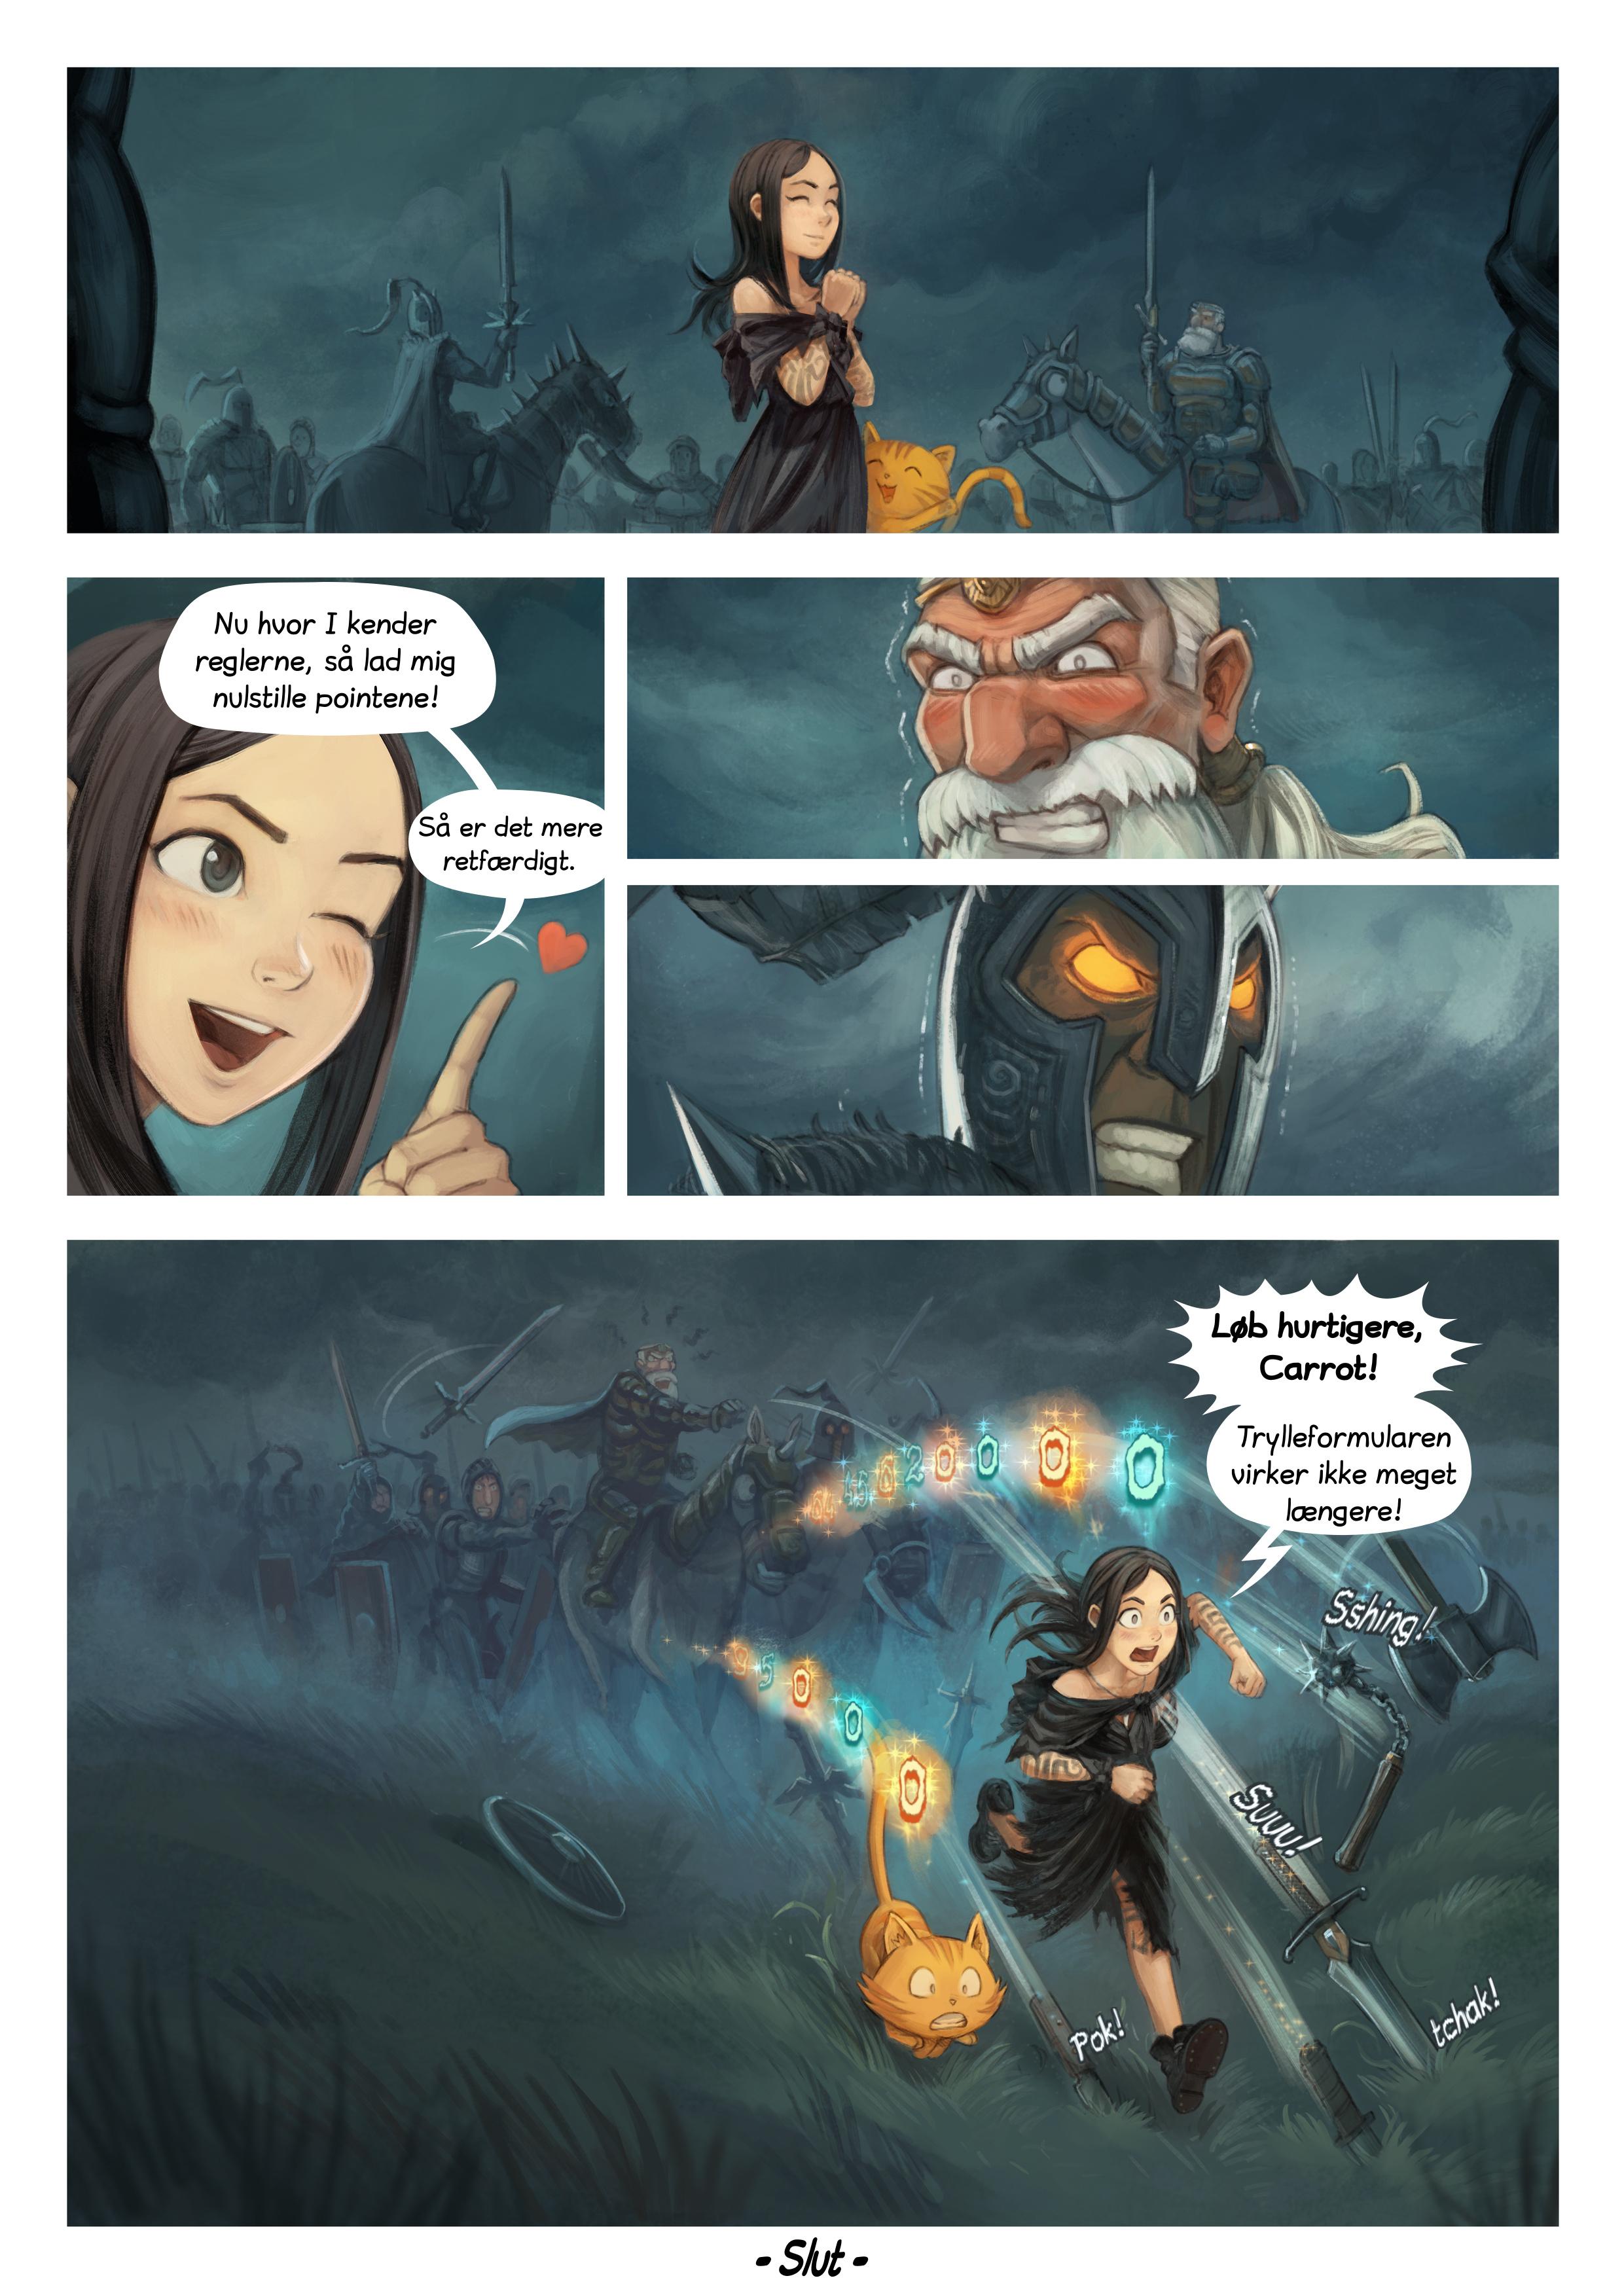 Episode 33: Krigs-trylleformularen, Page 8